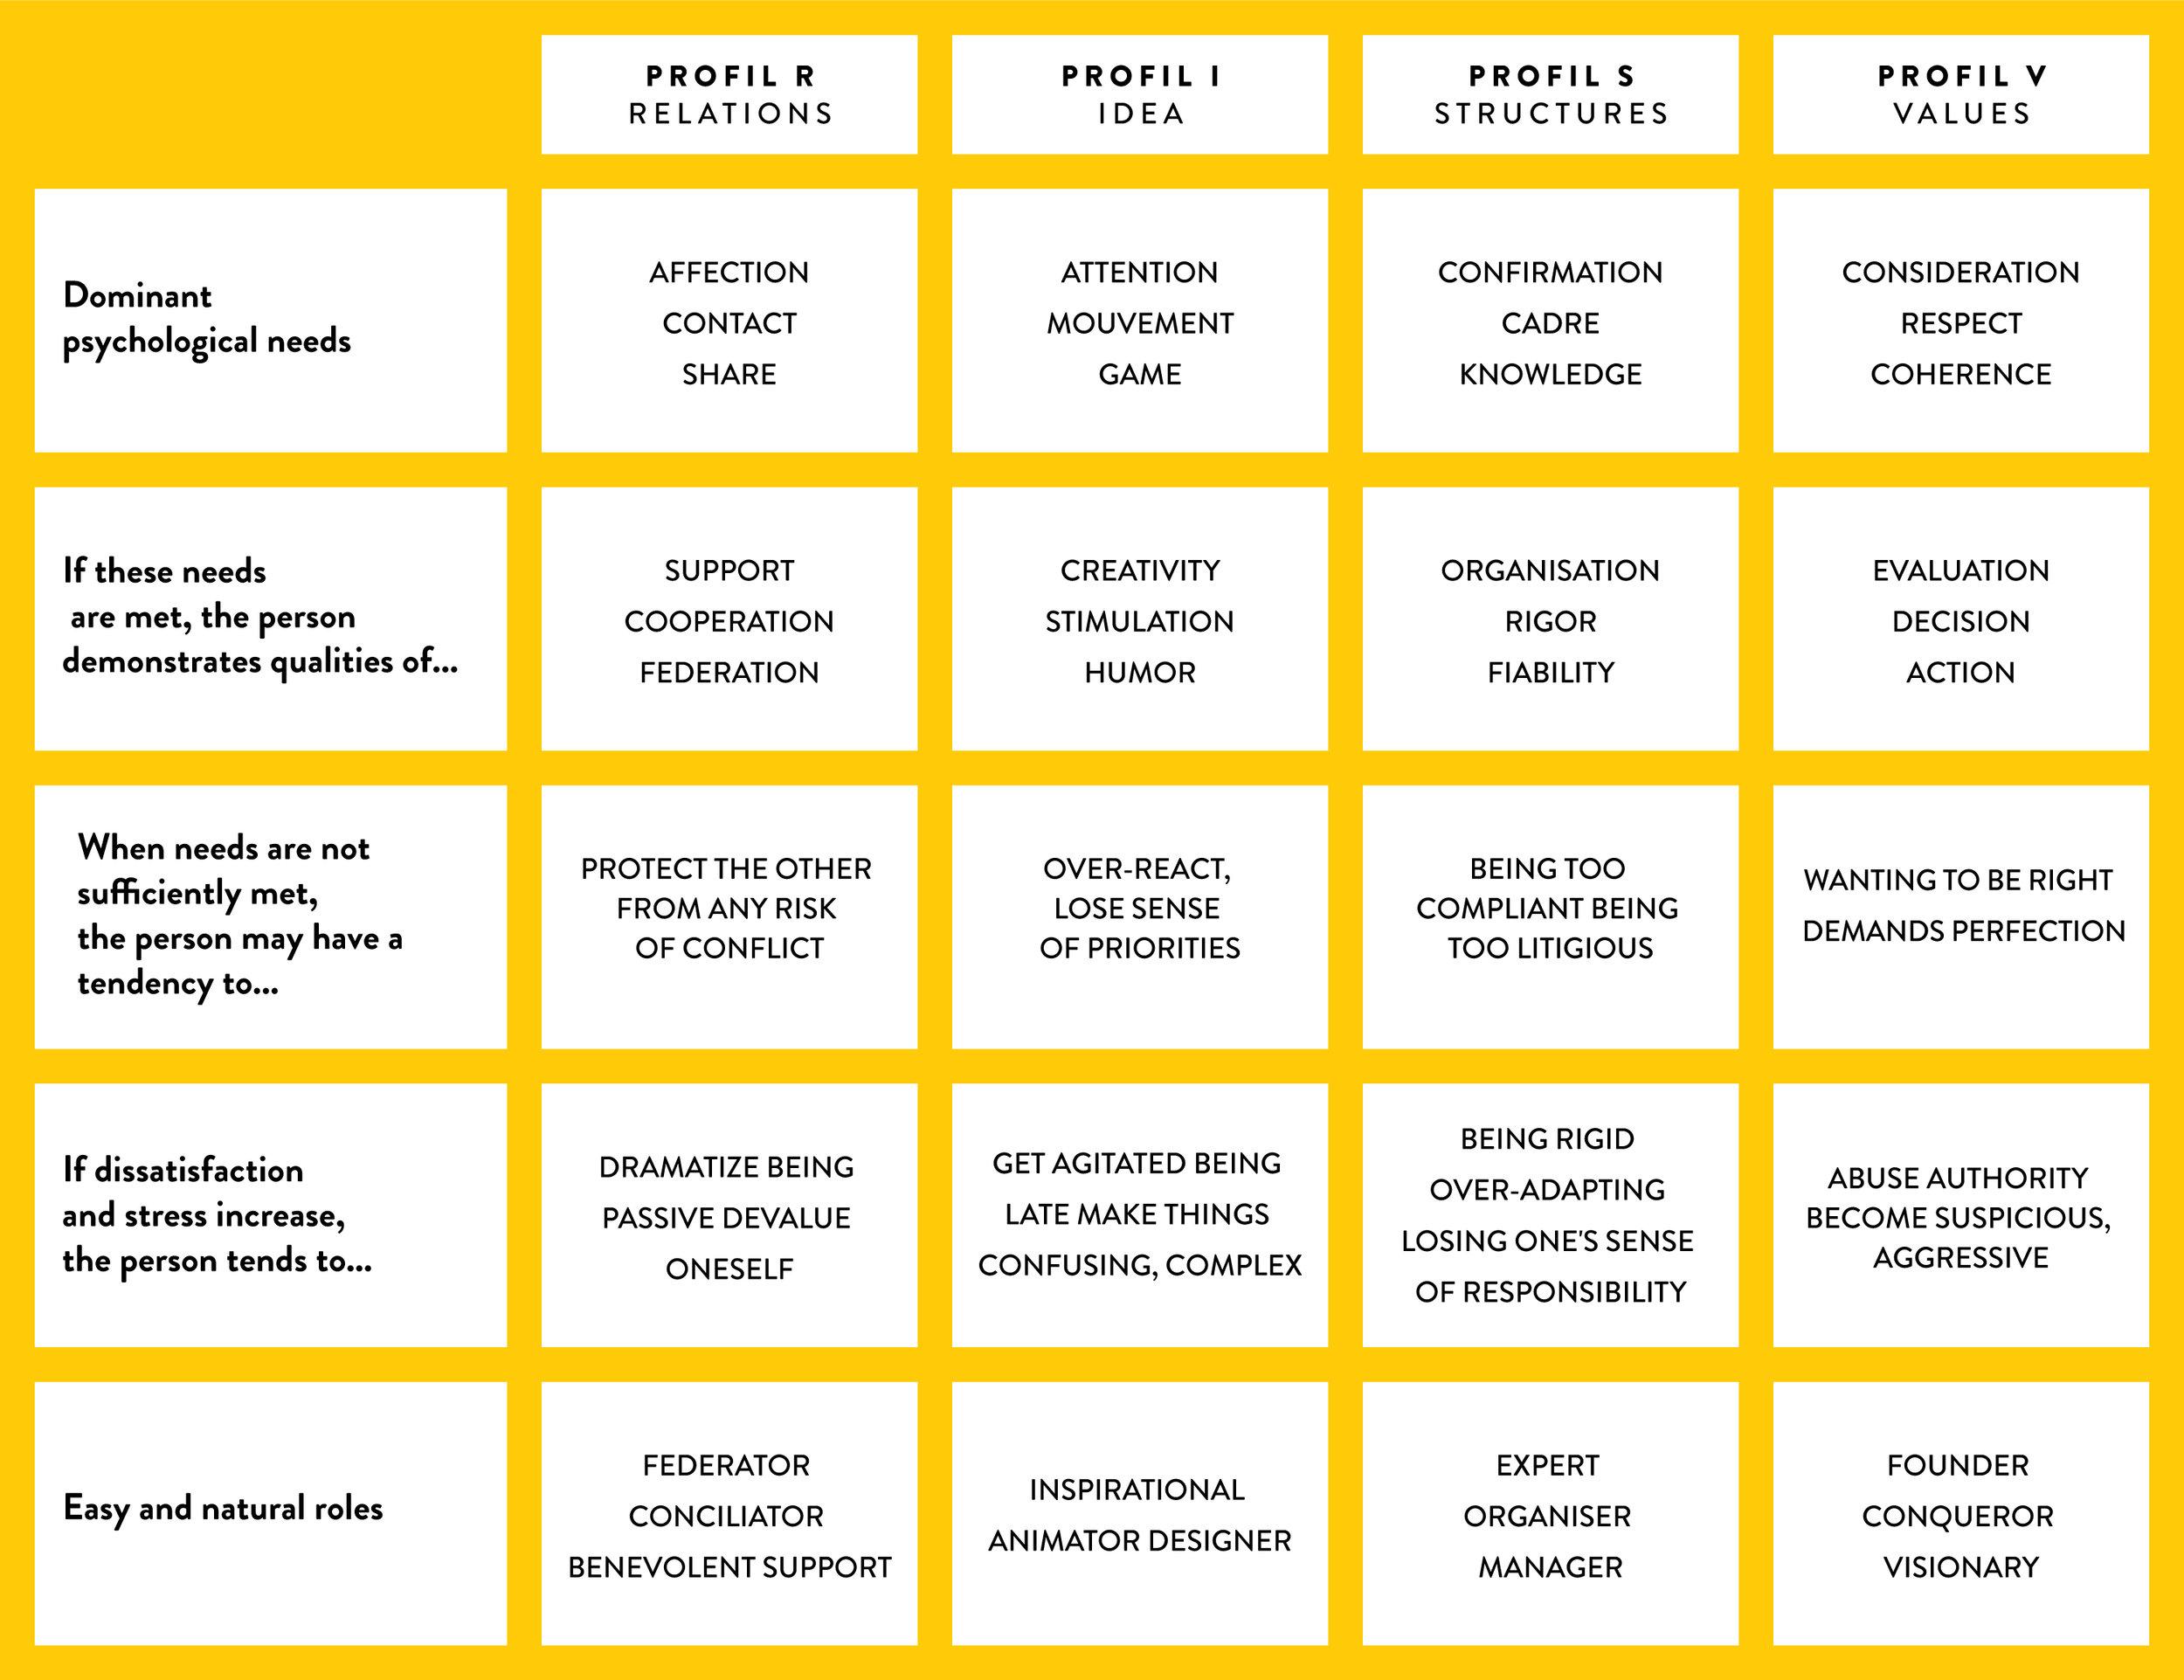 Tableau-recap-profiles.jpg